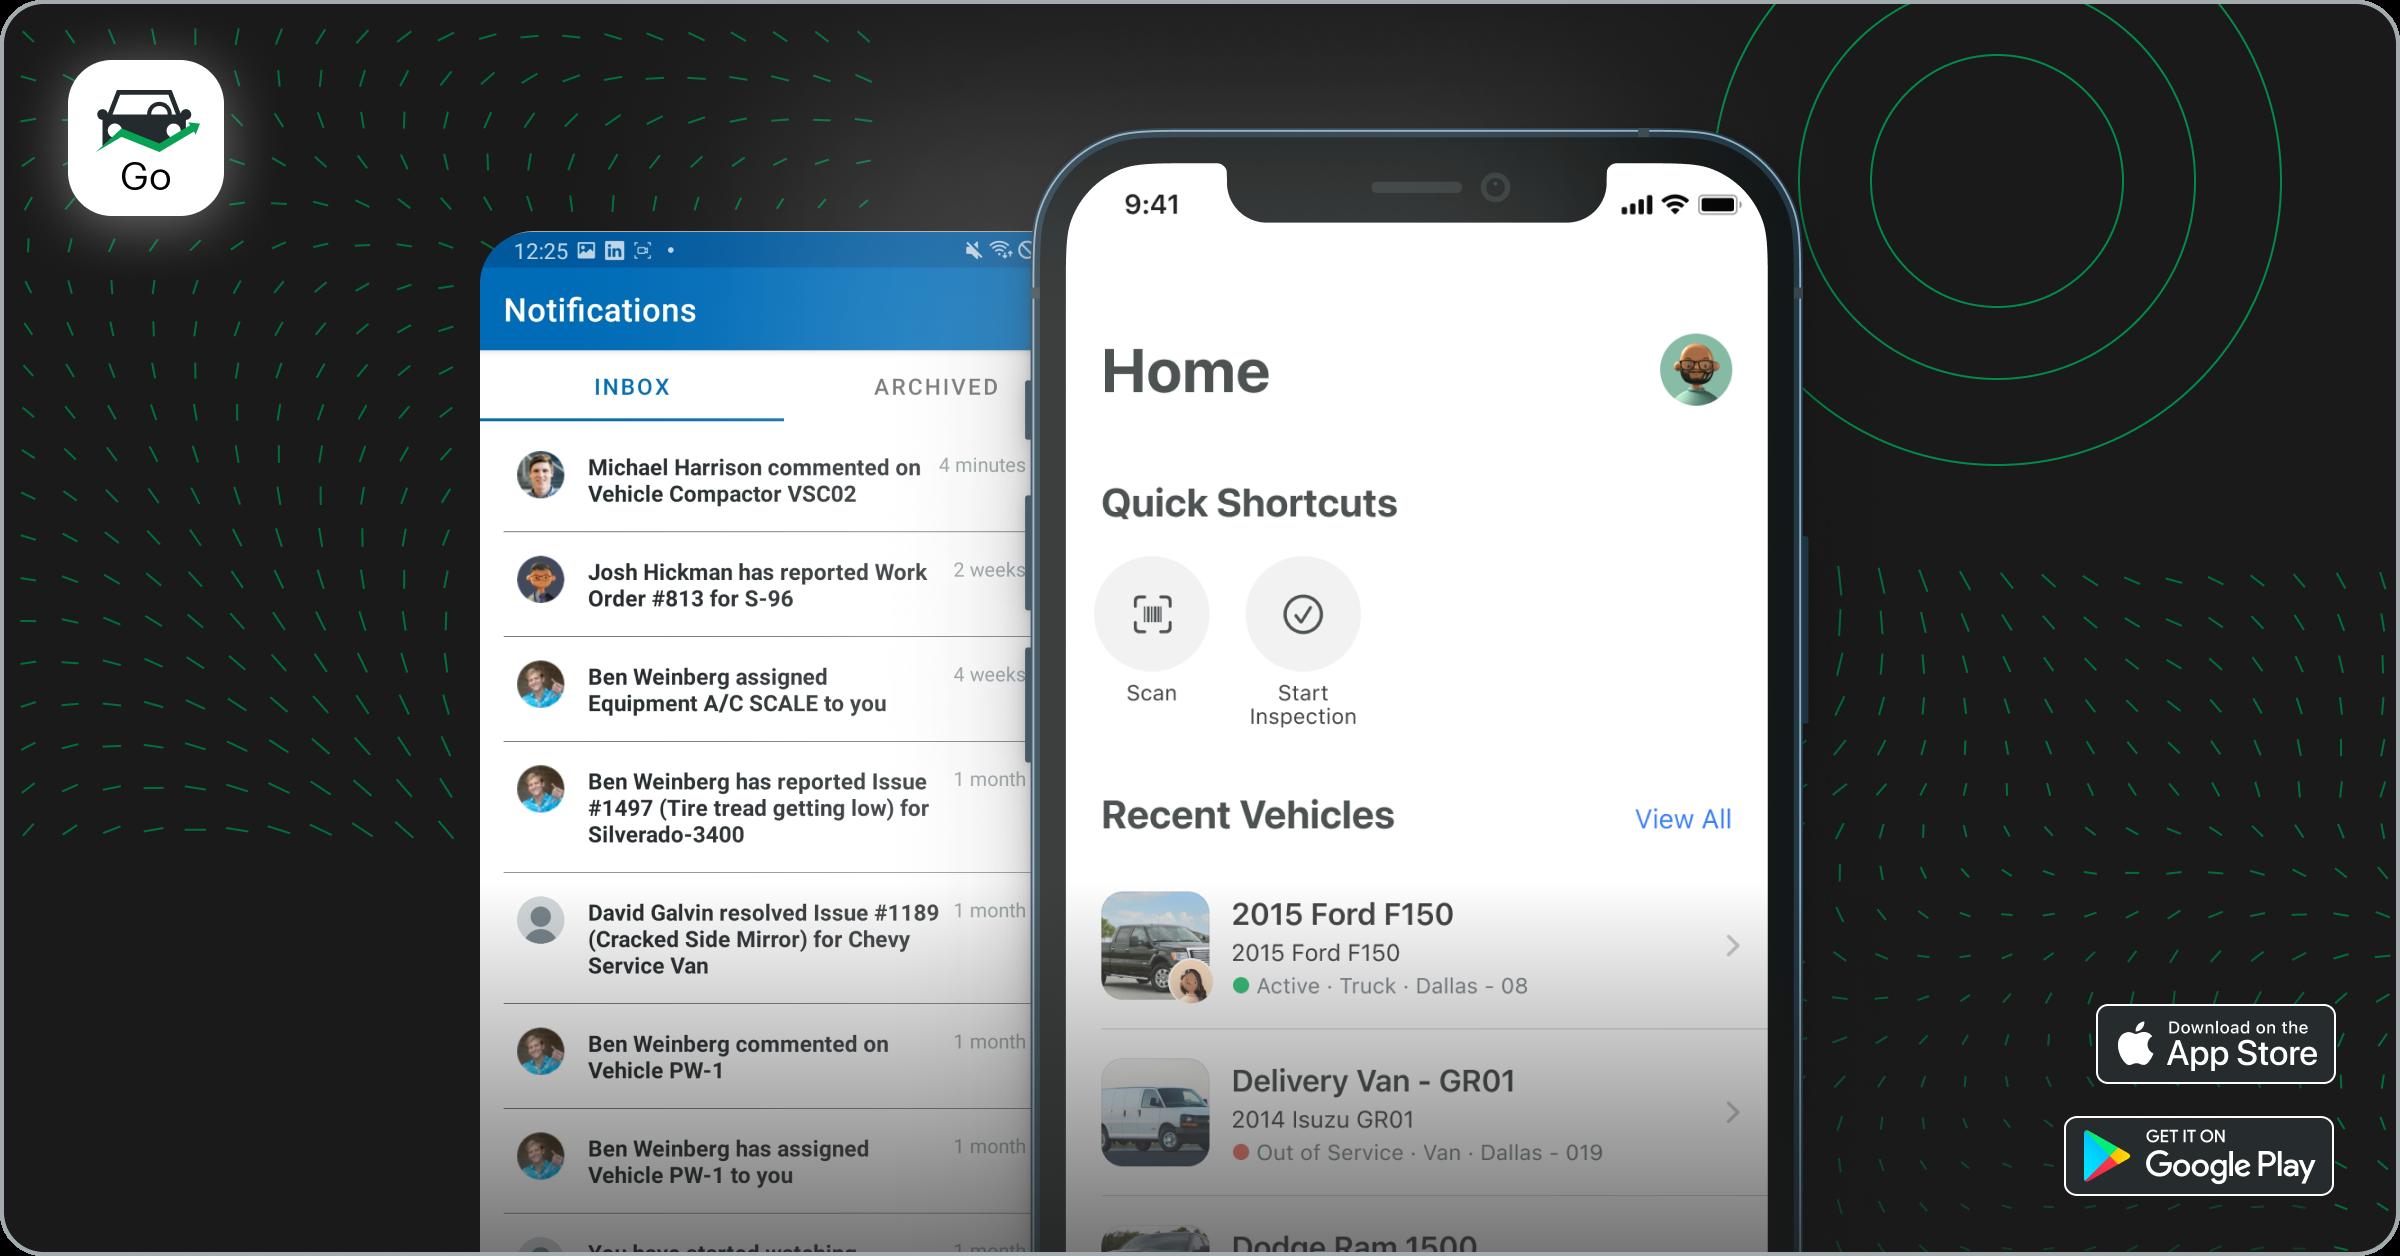 fleetio-go-mobile-app